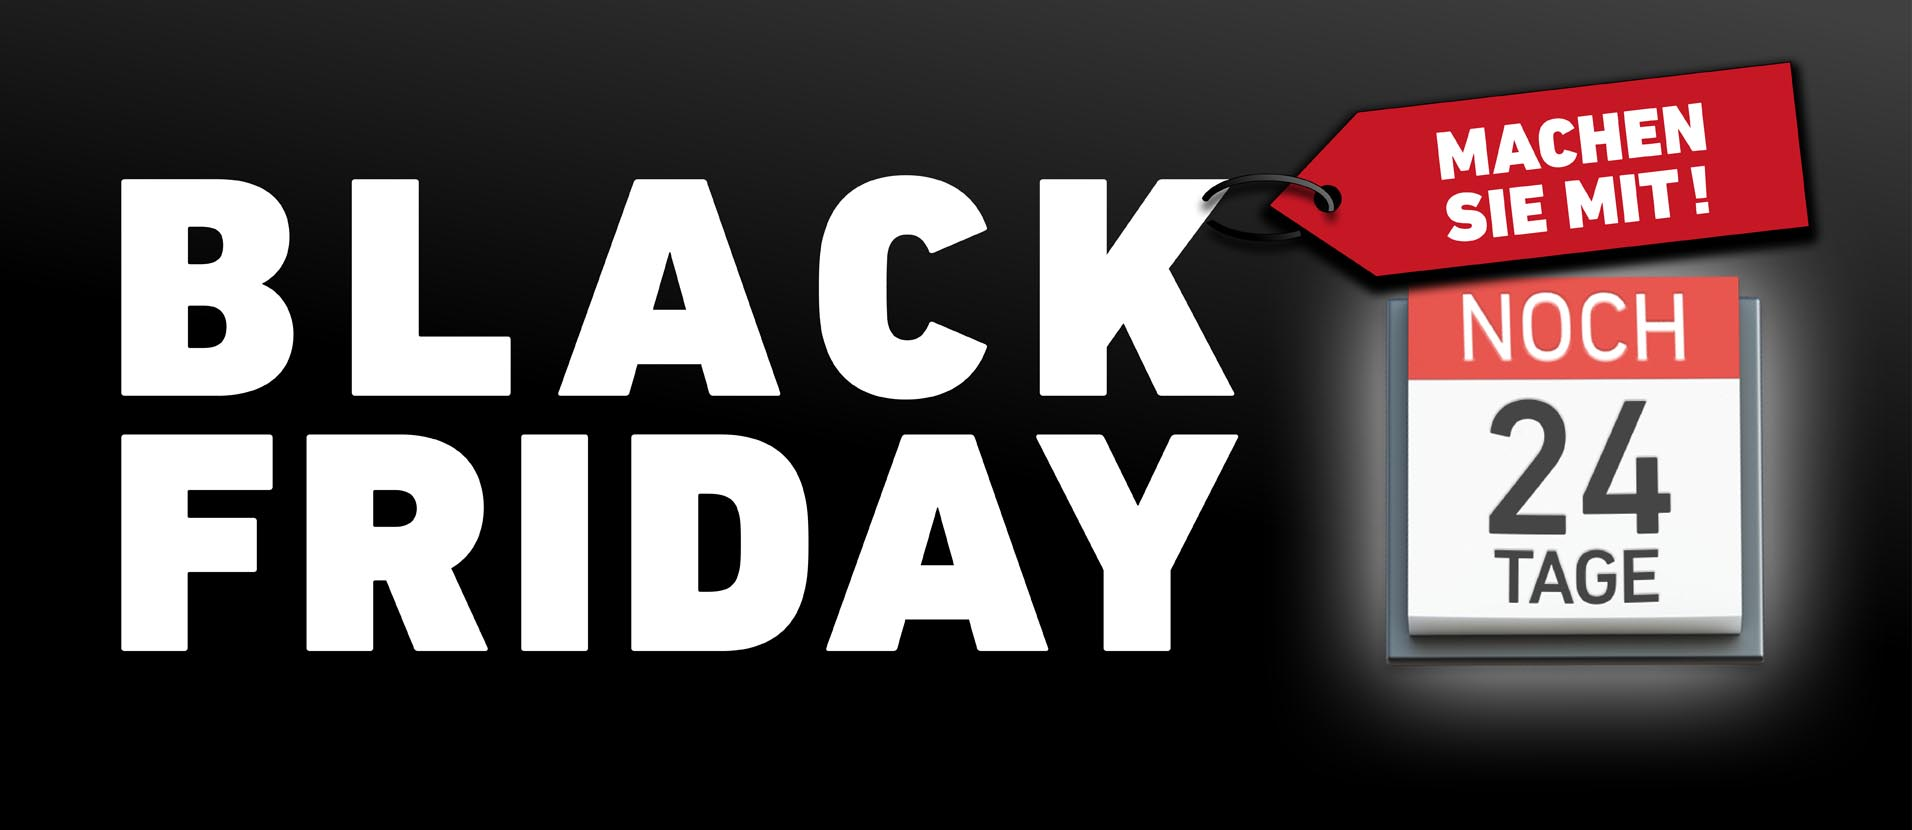 Black-Friday - Noch 24 Tage